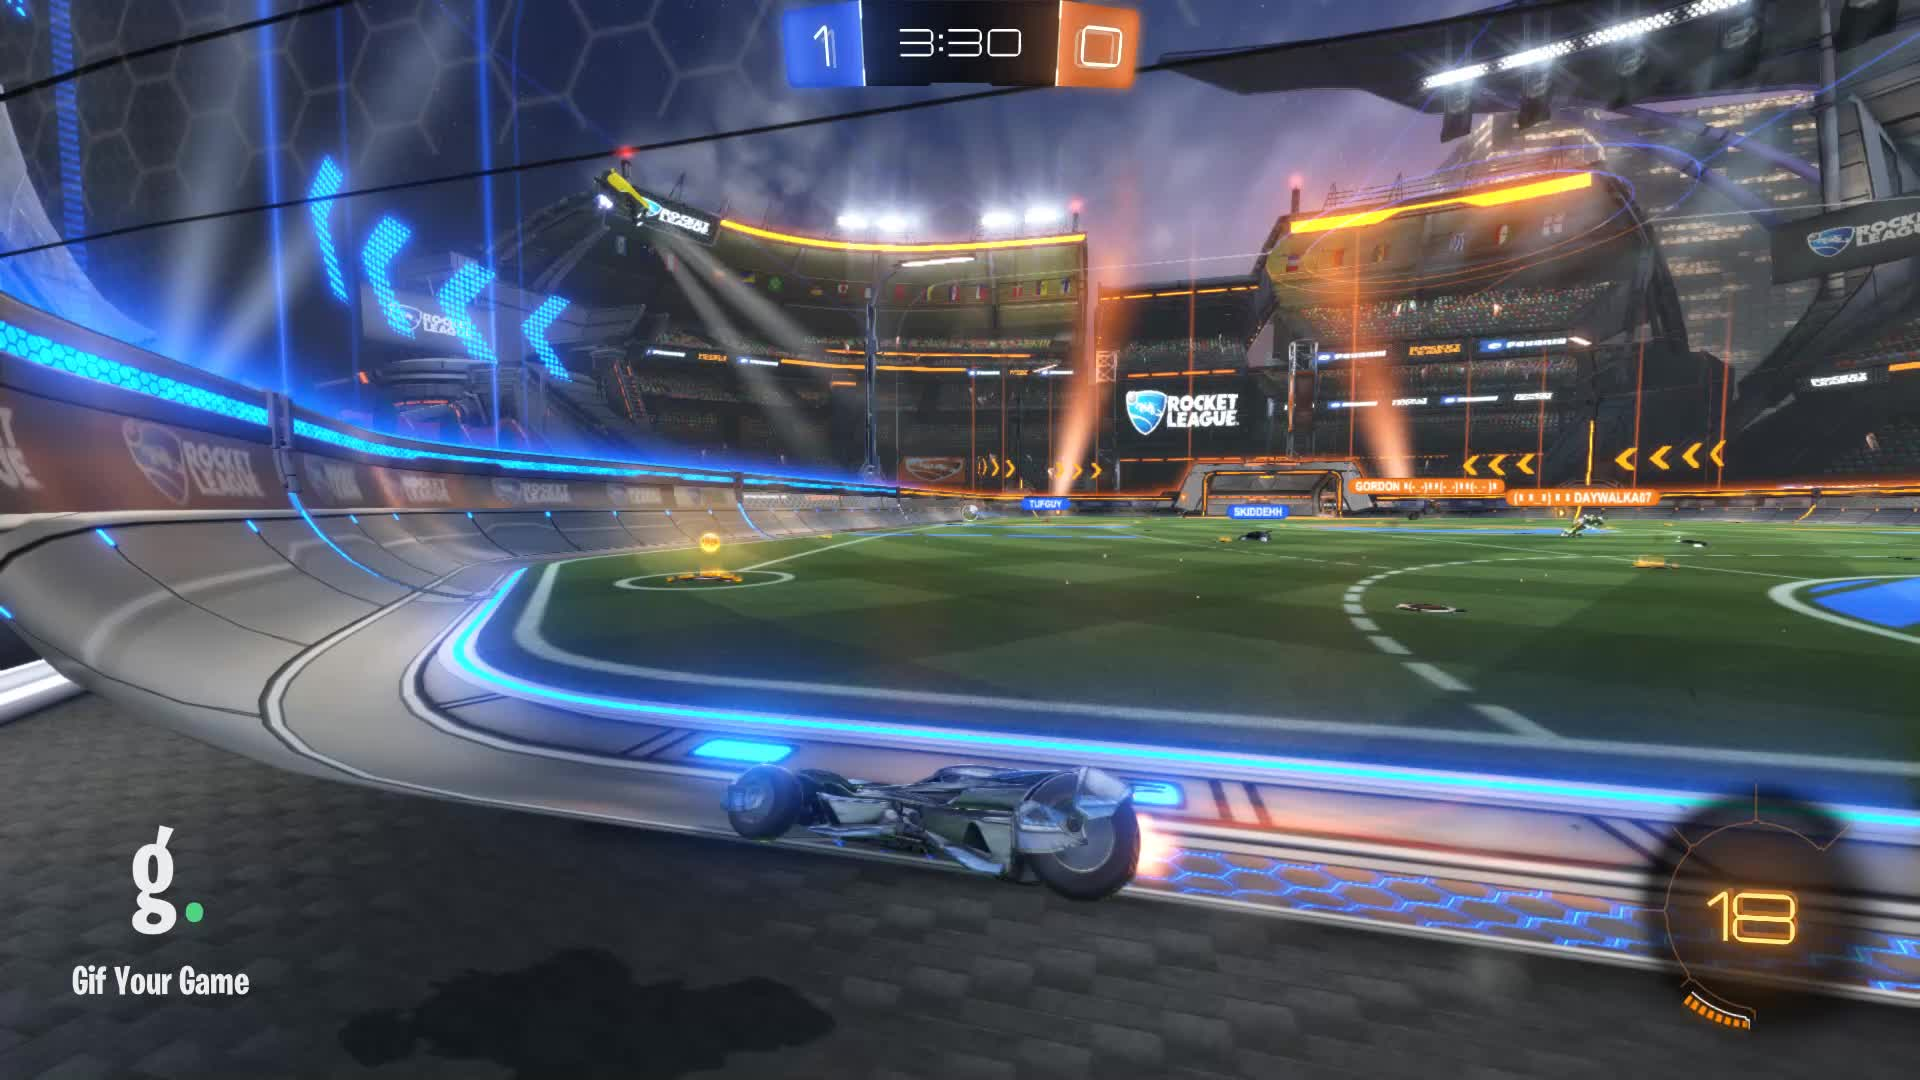 Gif Your Game, GifYourGame, Goal, Goldfish, Rocket League, RocketLeague, Goal 2: Goldfish GIFs